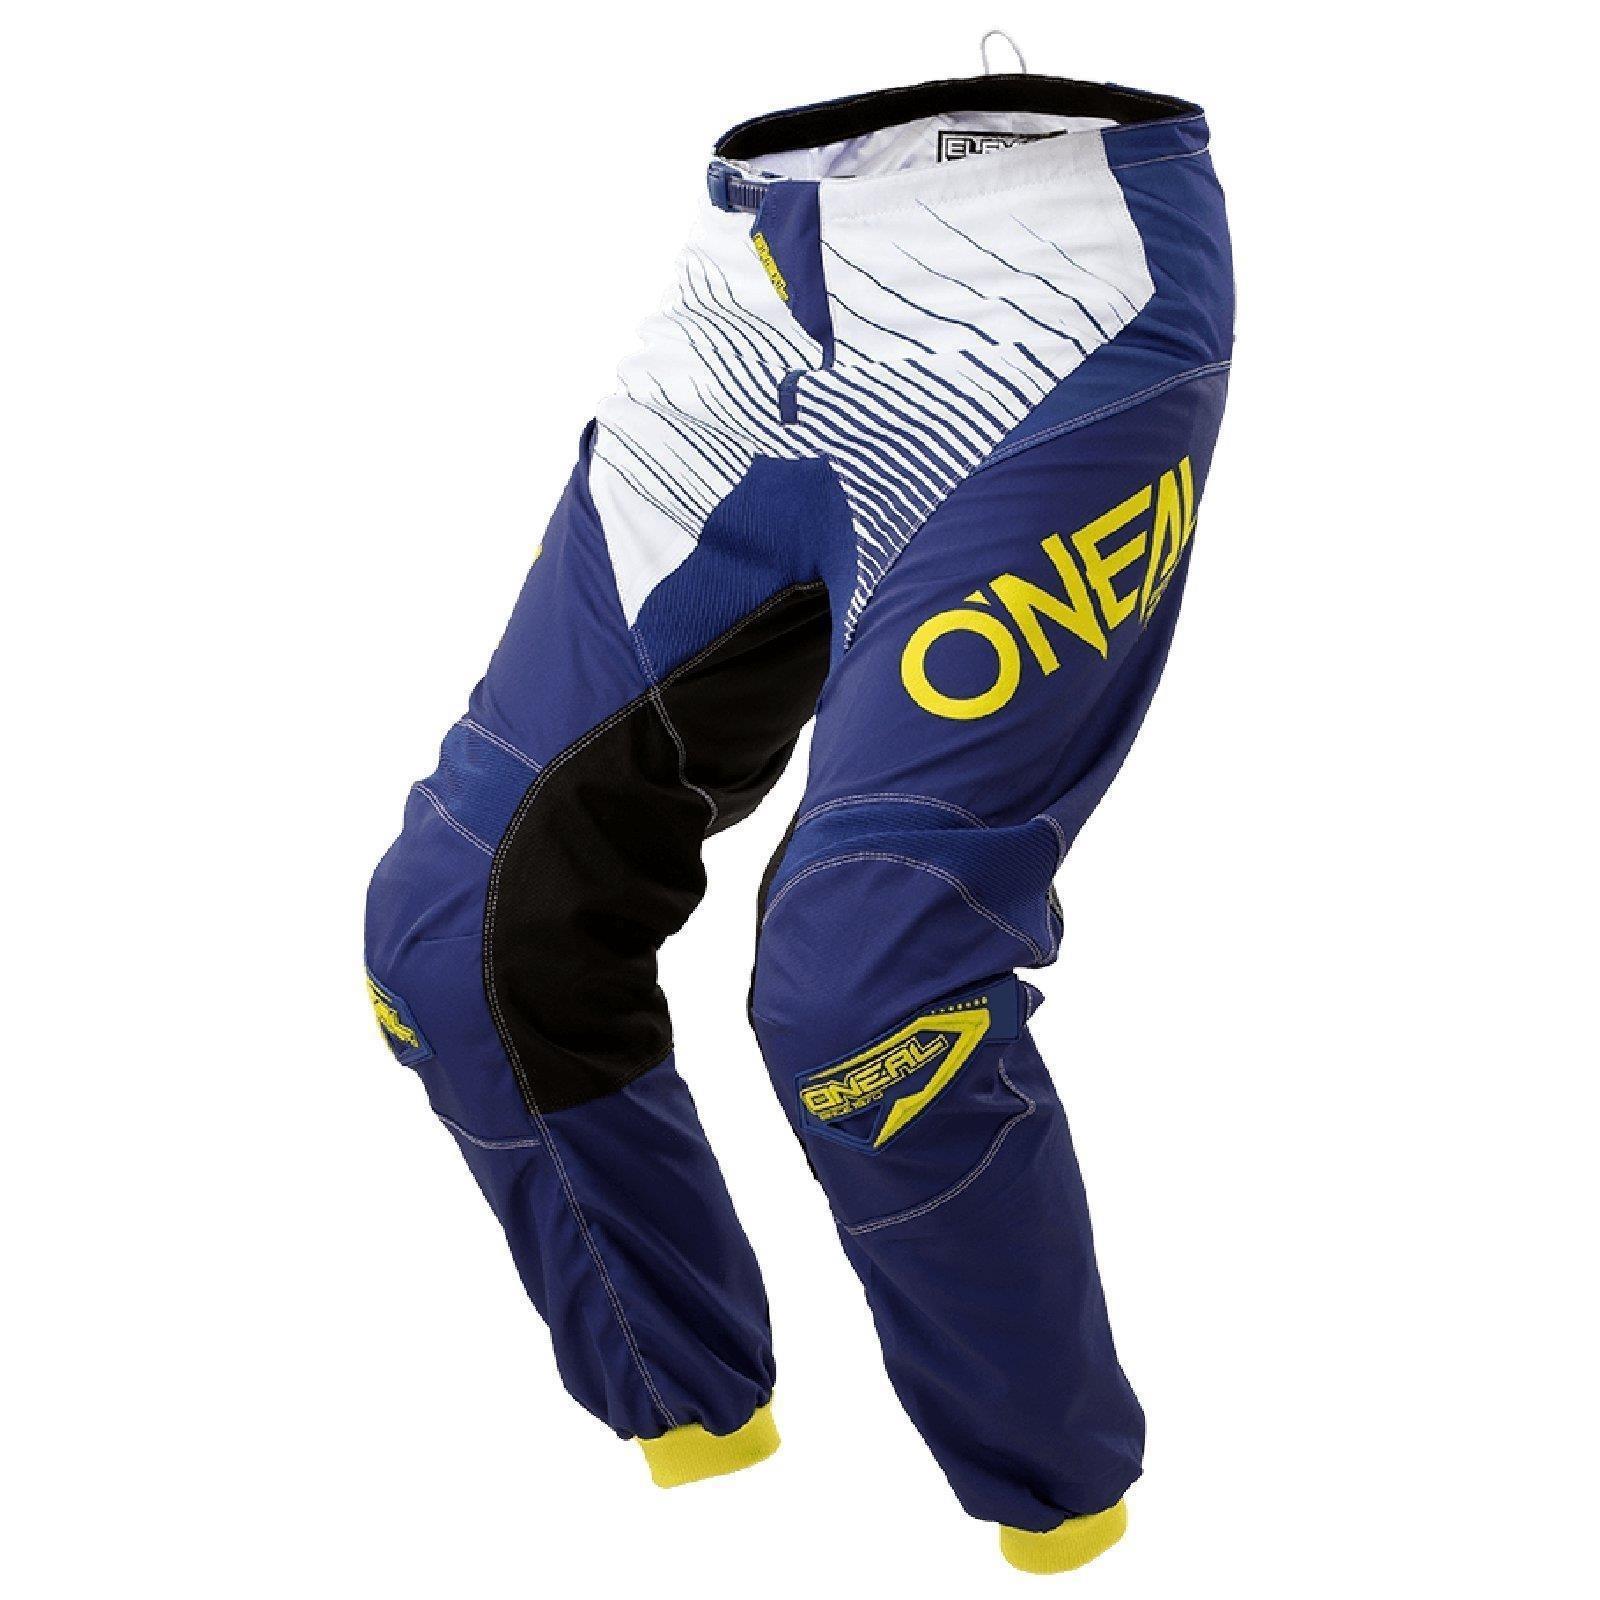 Elemento-oNeal-racewear-Jersey-pantalones-a-ninos-adulto-Motocross-Enduro-downhill miniatura 22